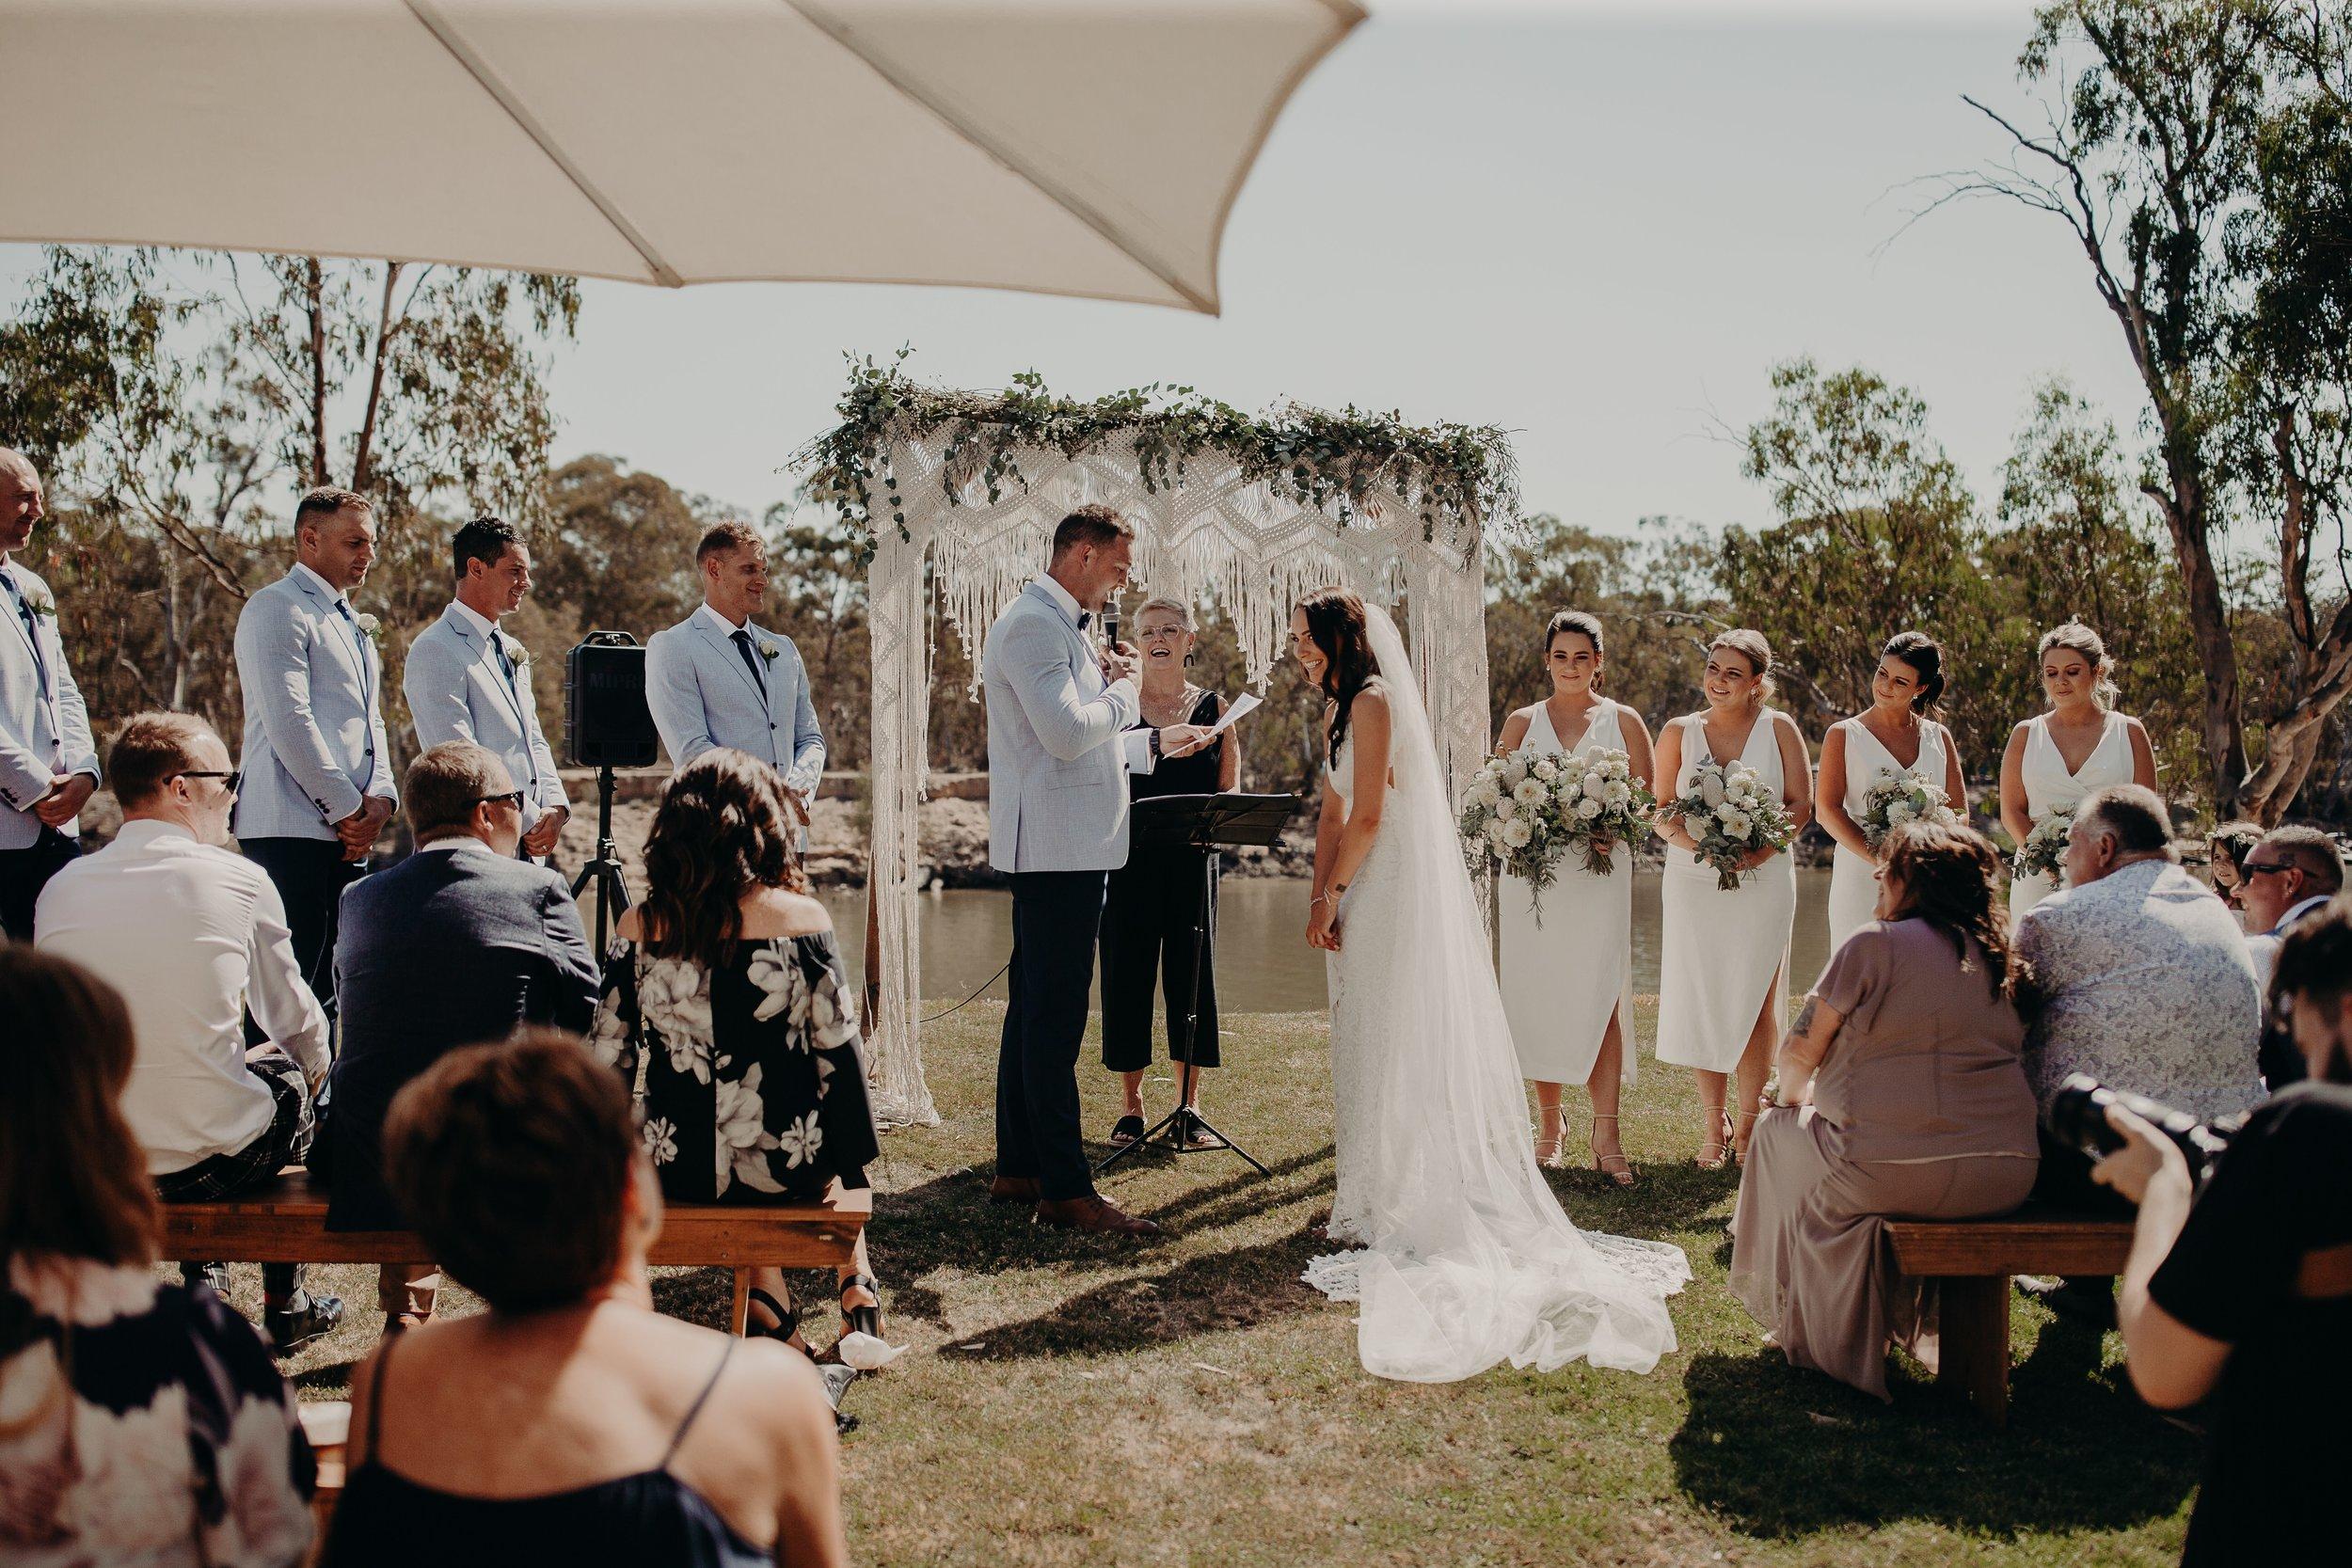 mickalathomas_puremacphotography_weddingphotographer_couplephotographer_Sheppartonphotographer_2875.jpg